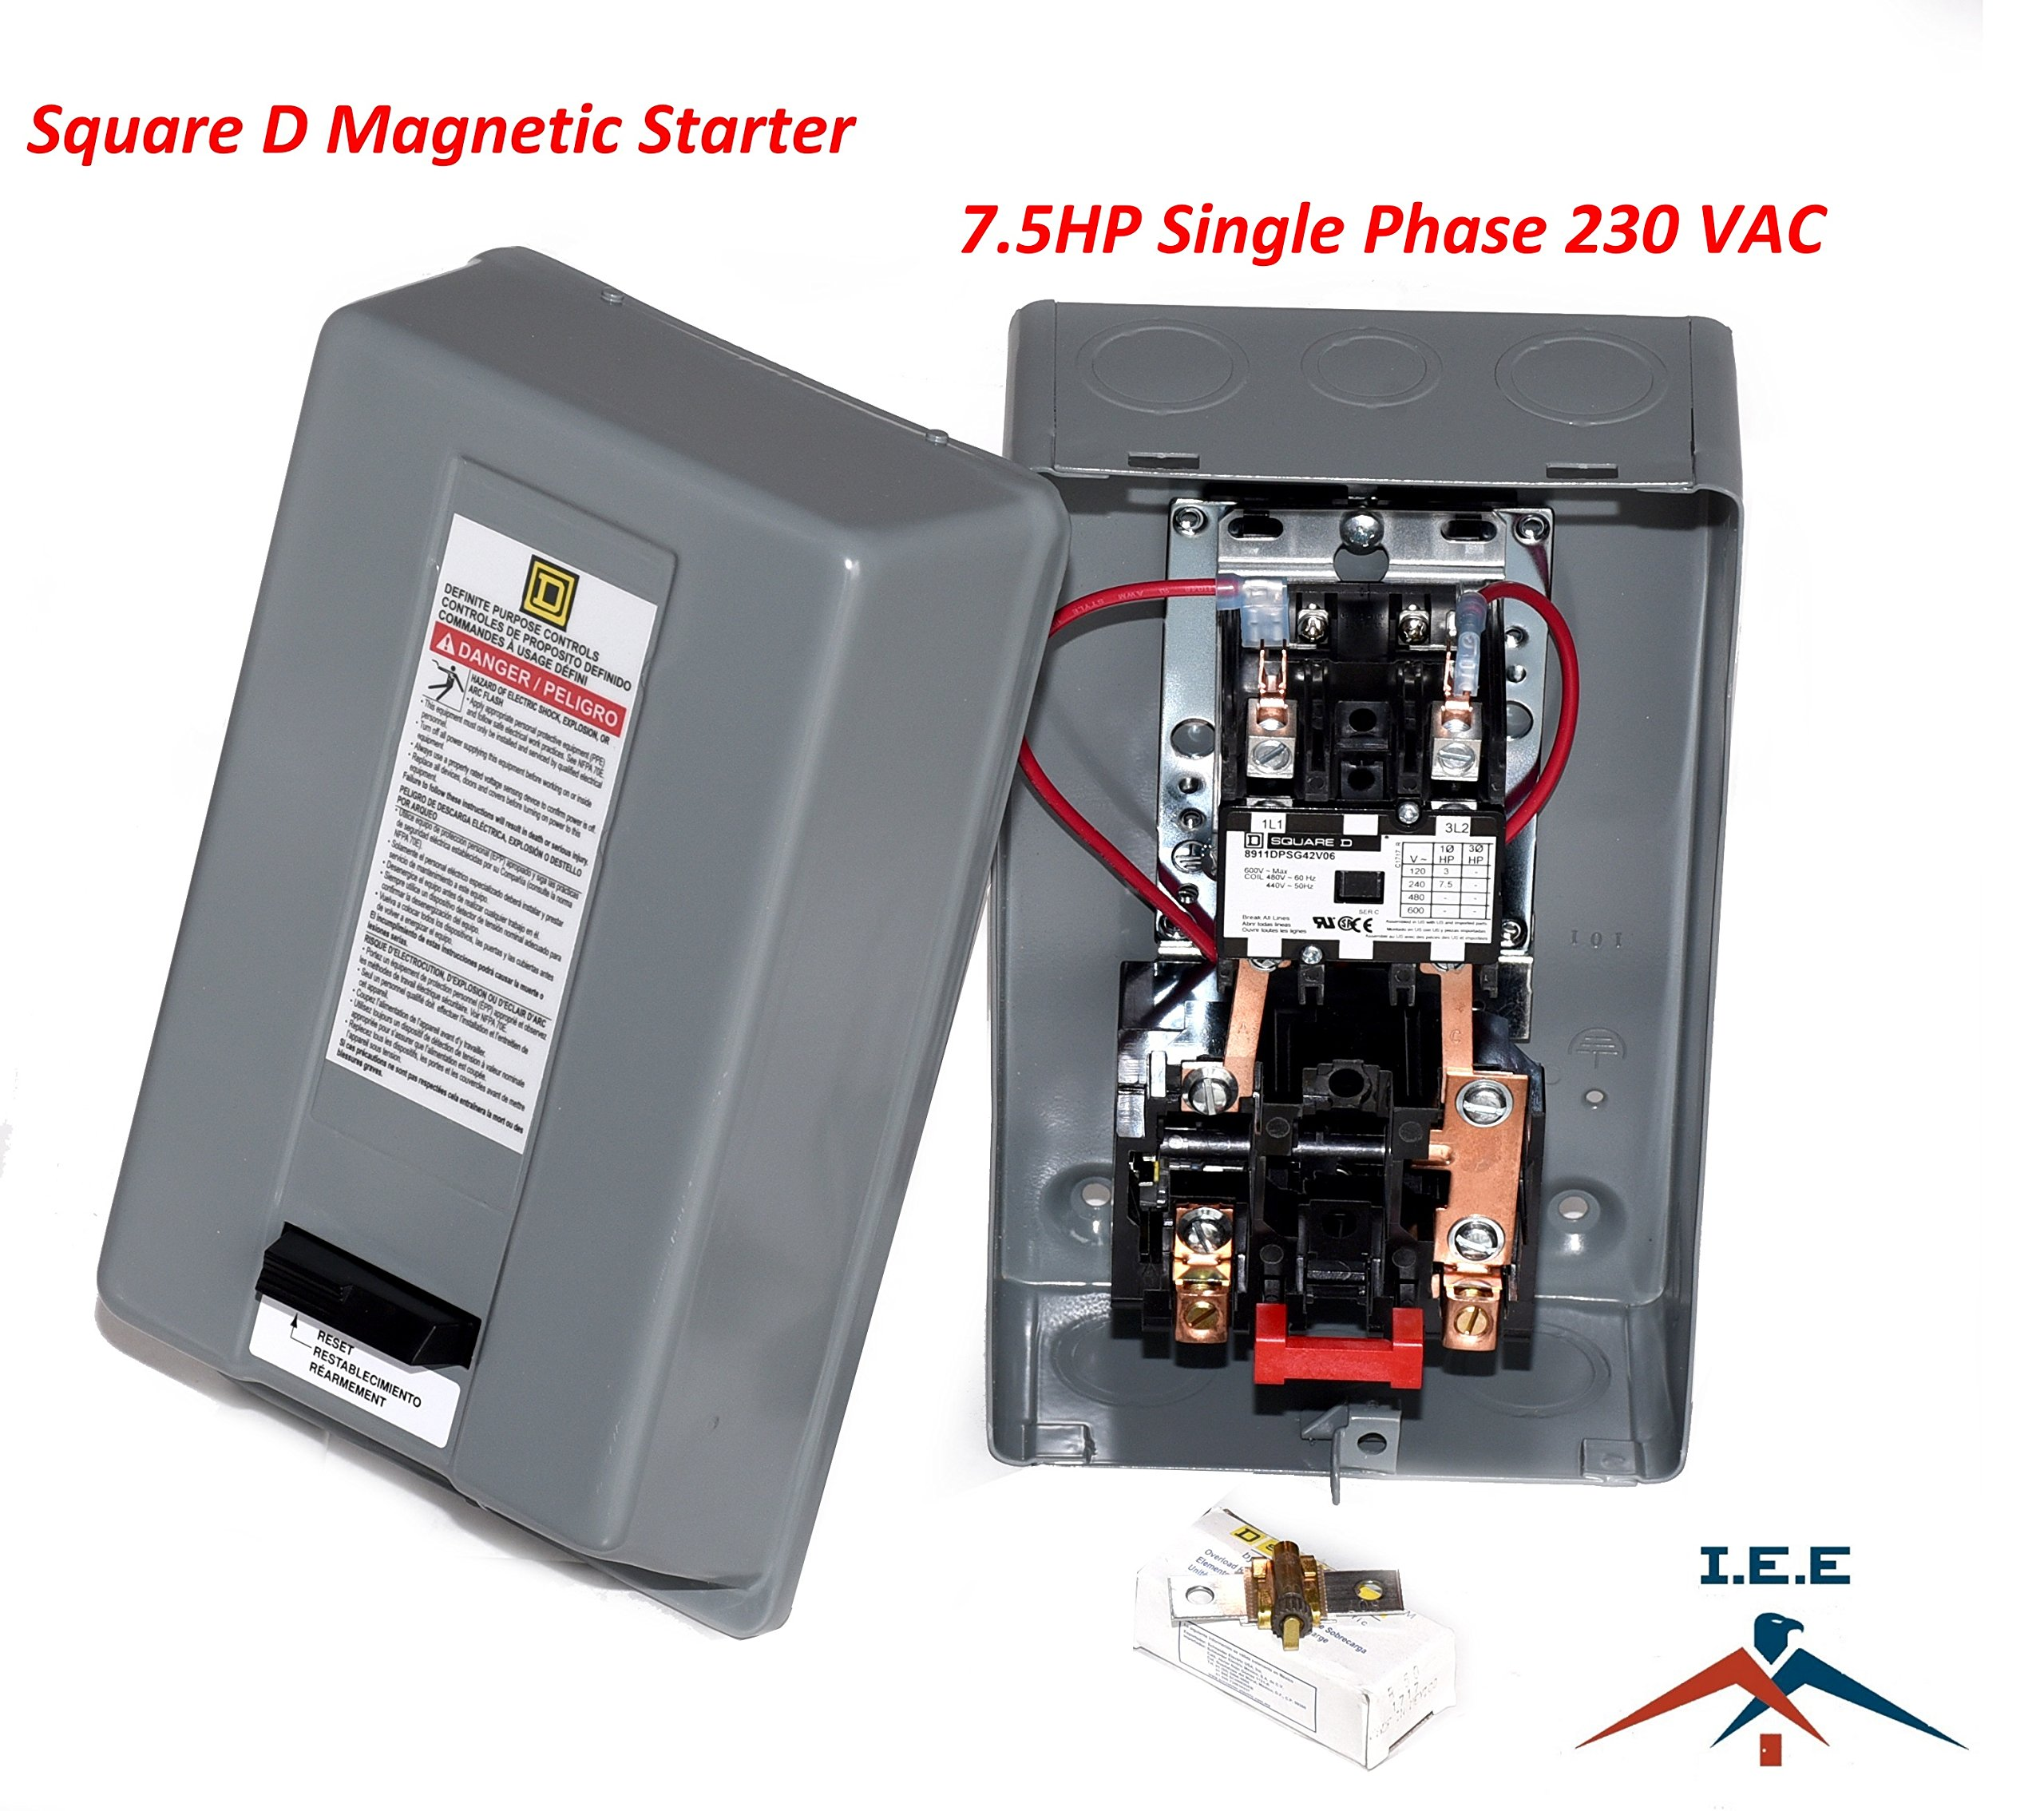 SQUARE D MAGNETIC STARTER CONRTROL ELECTRIC MOTOR 8911DPSG42V09 7.5HP 1-PH 230V